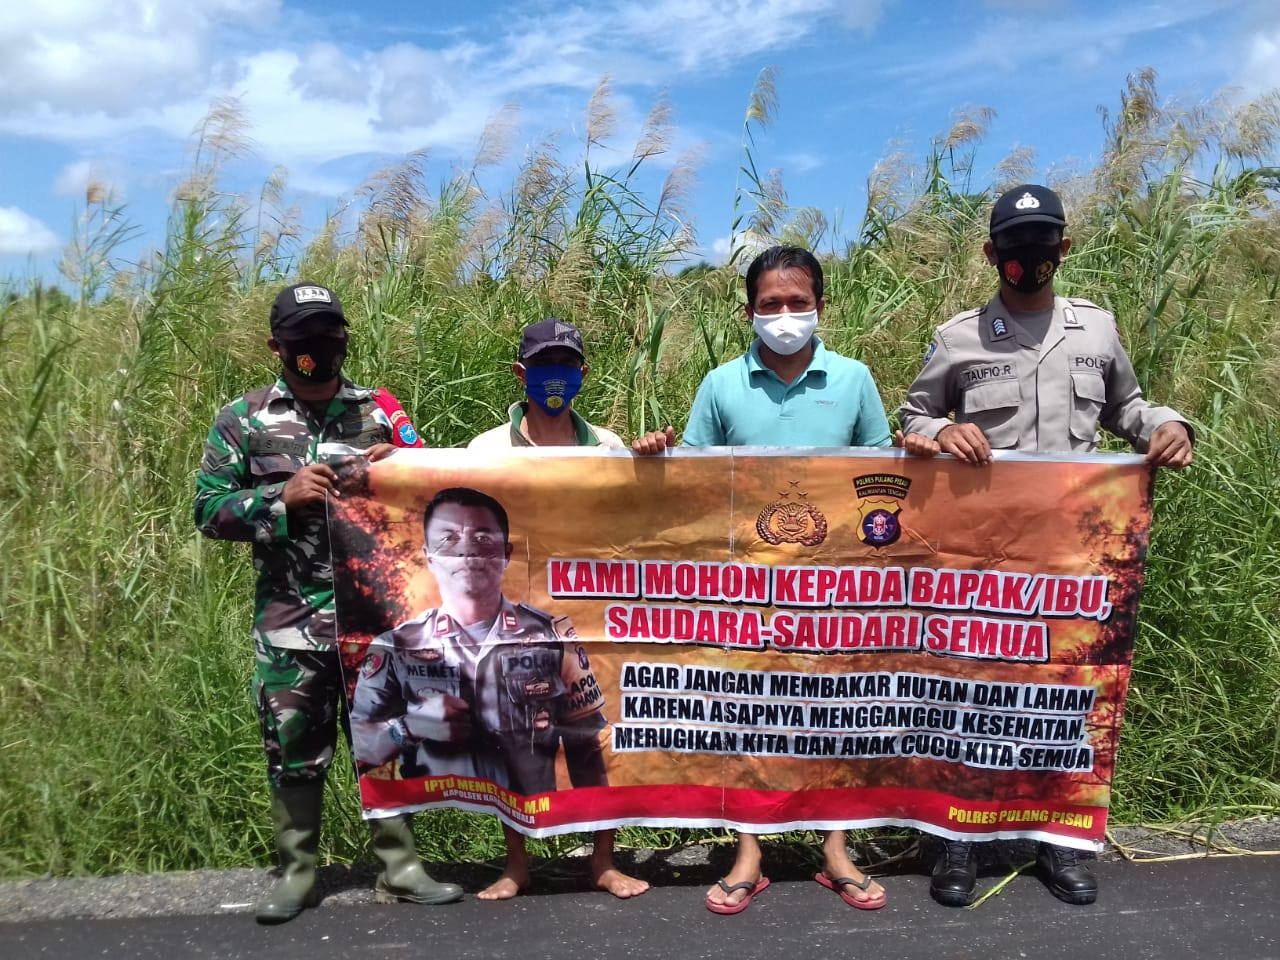 Cegah Karhutla, Polsek Kahayan Kuala dan Koramil Bahaur Bersinergi Sampaikan Imbauan